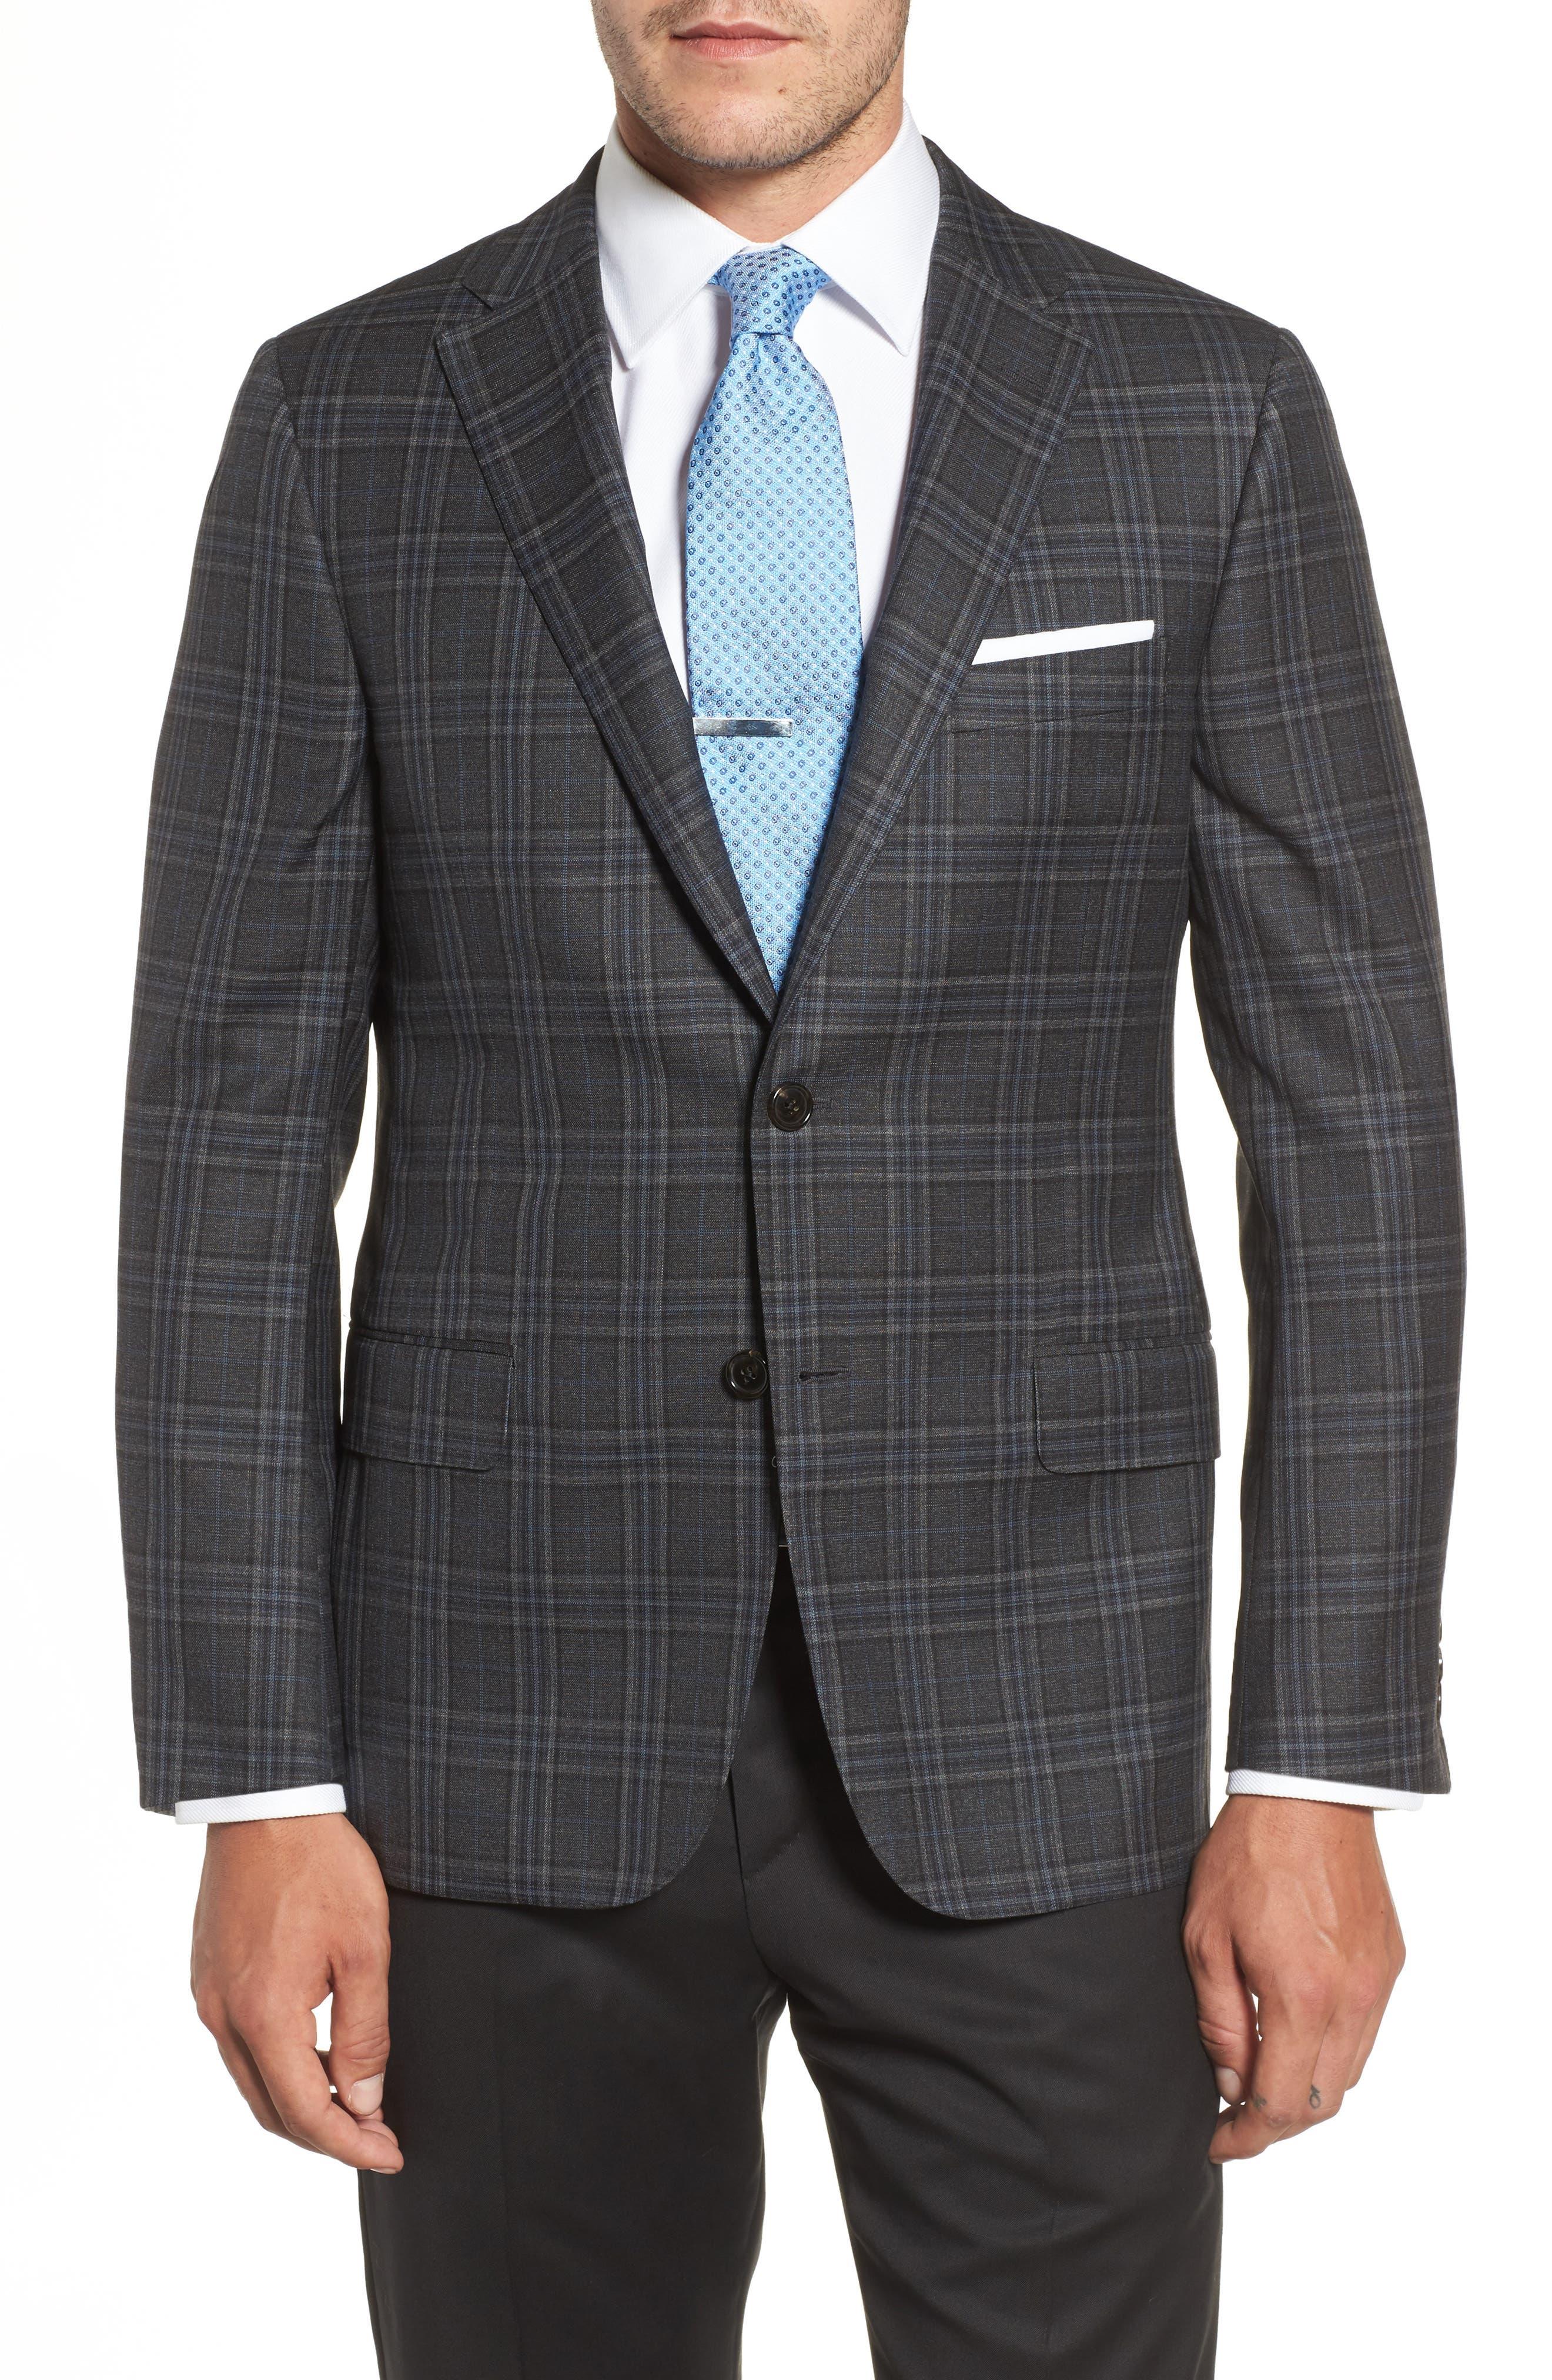 Main Image - Hickey Freeman Classic B Fit Plaid Wool Sport Coat